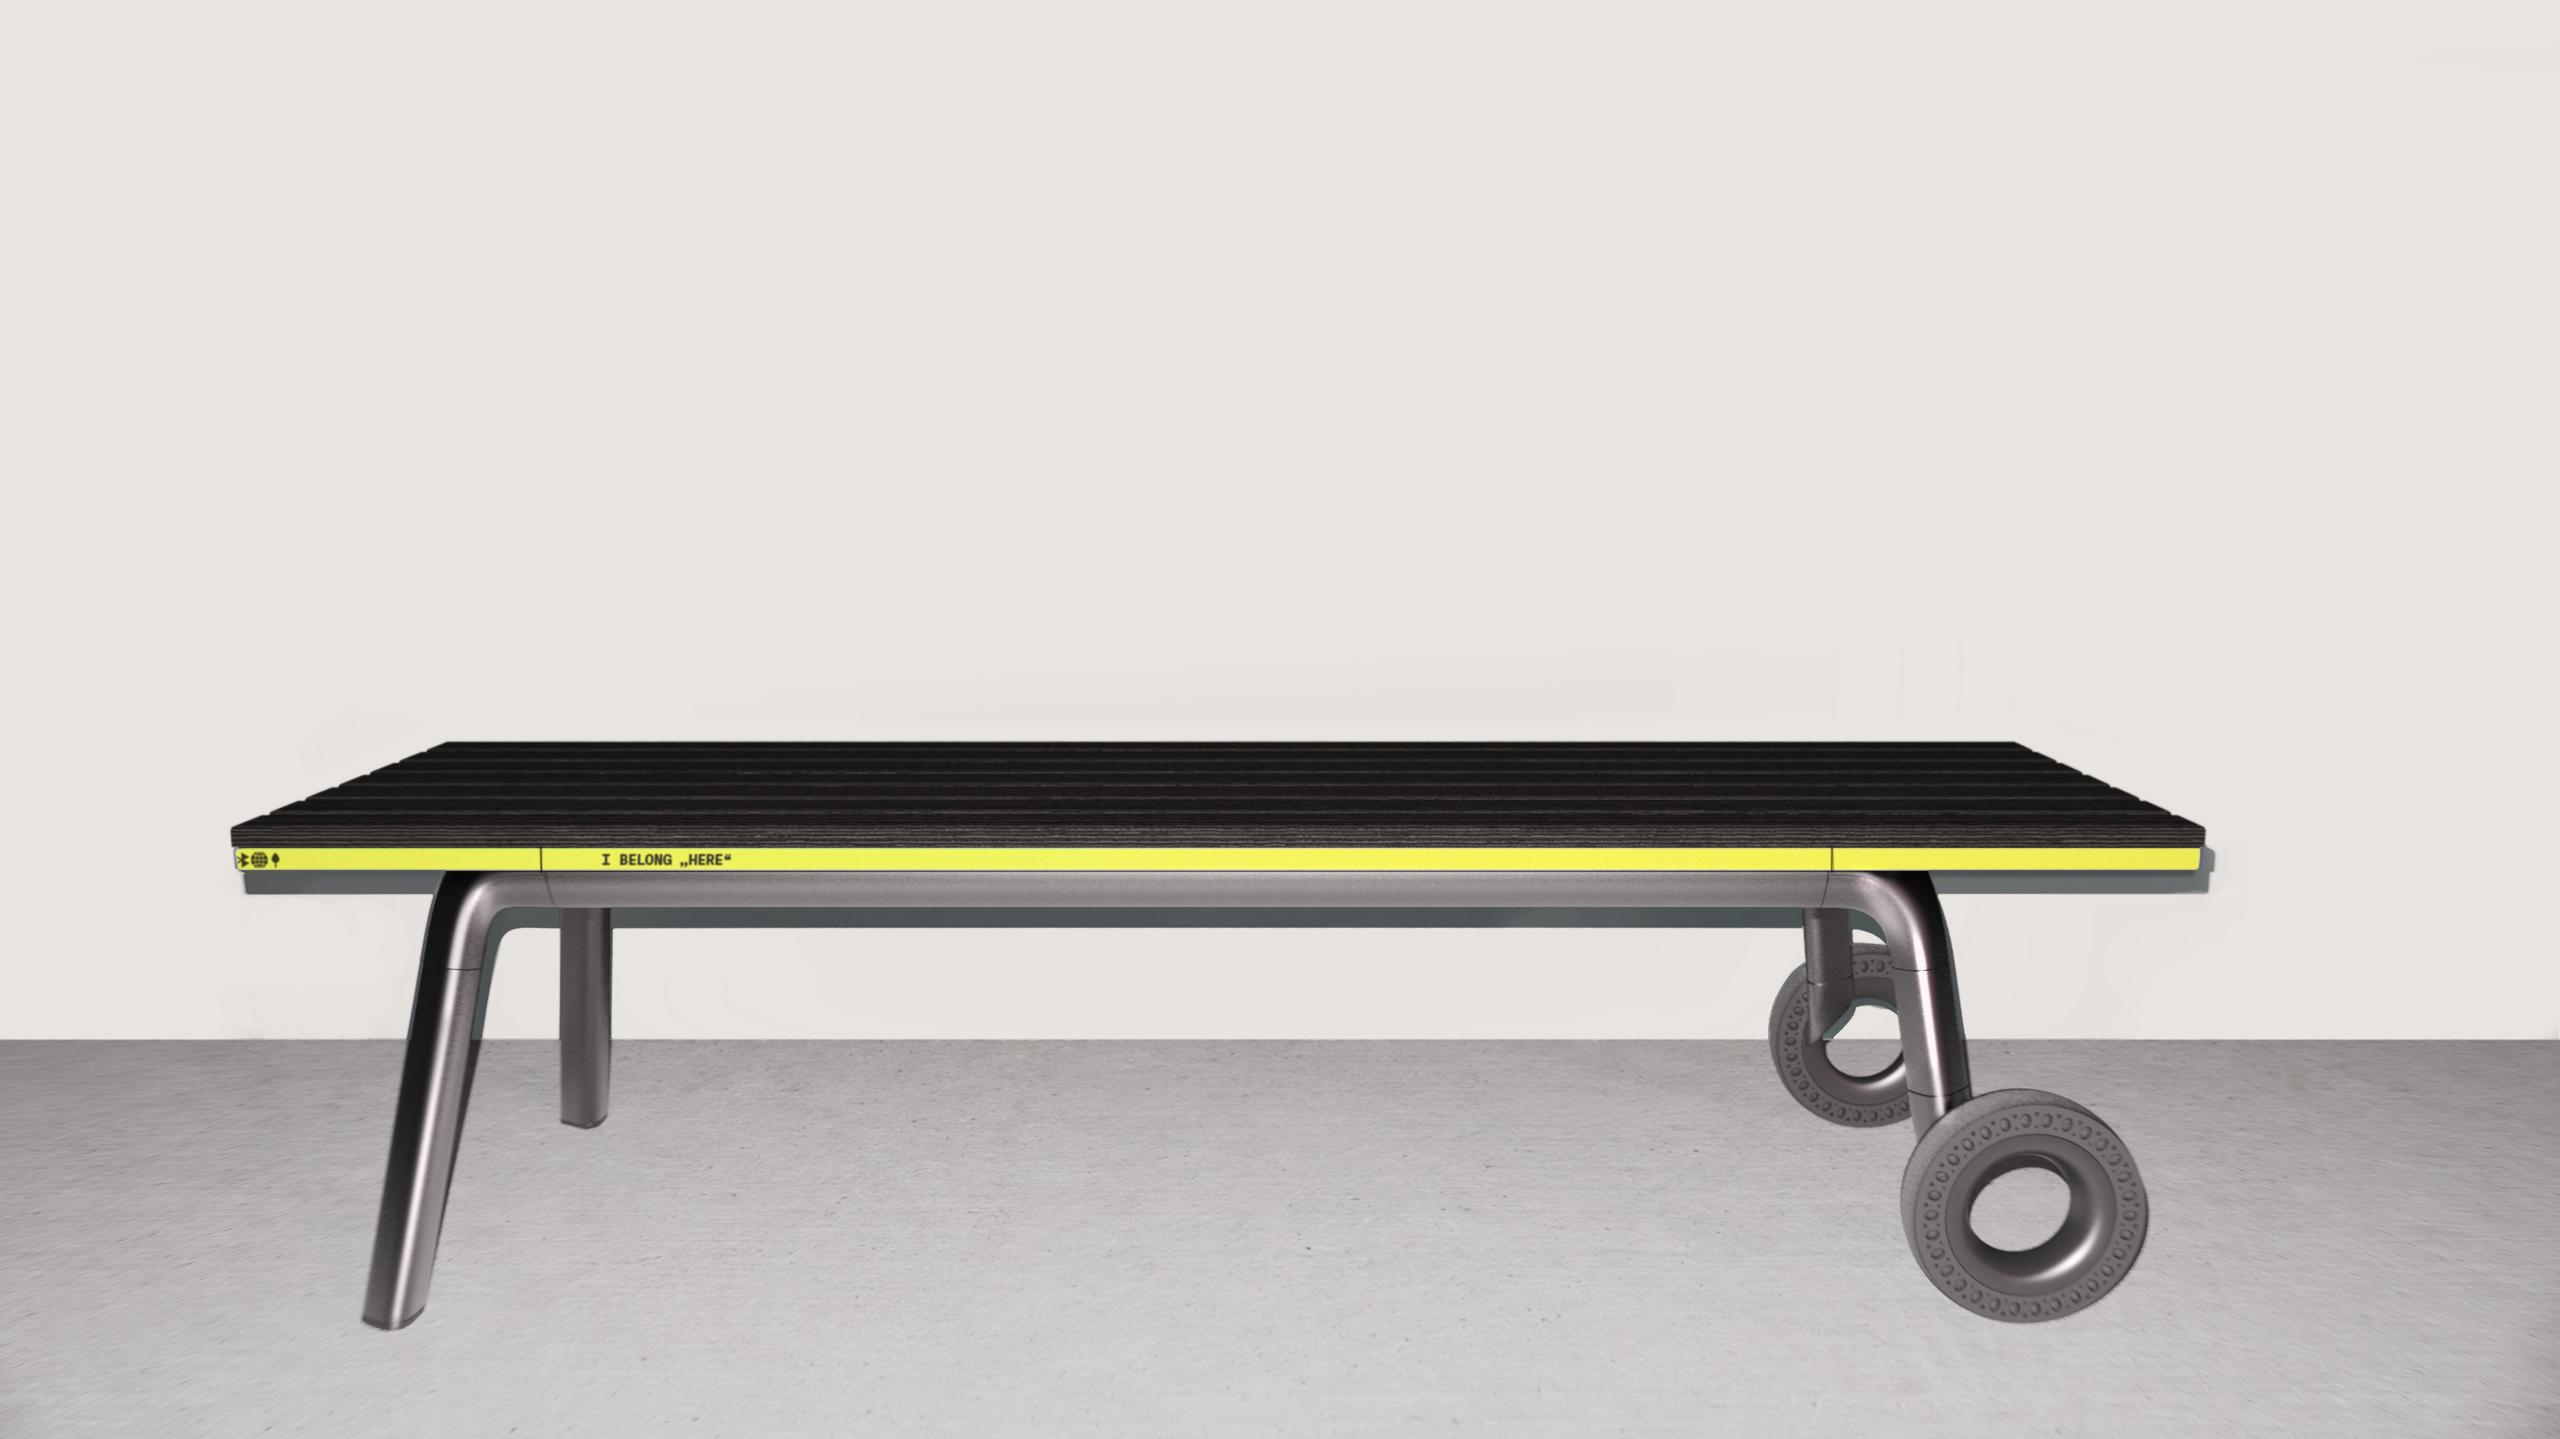 MOB-001 Mobile Street Furniture Max Hausmann Call for Creatives